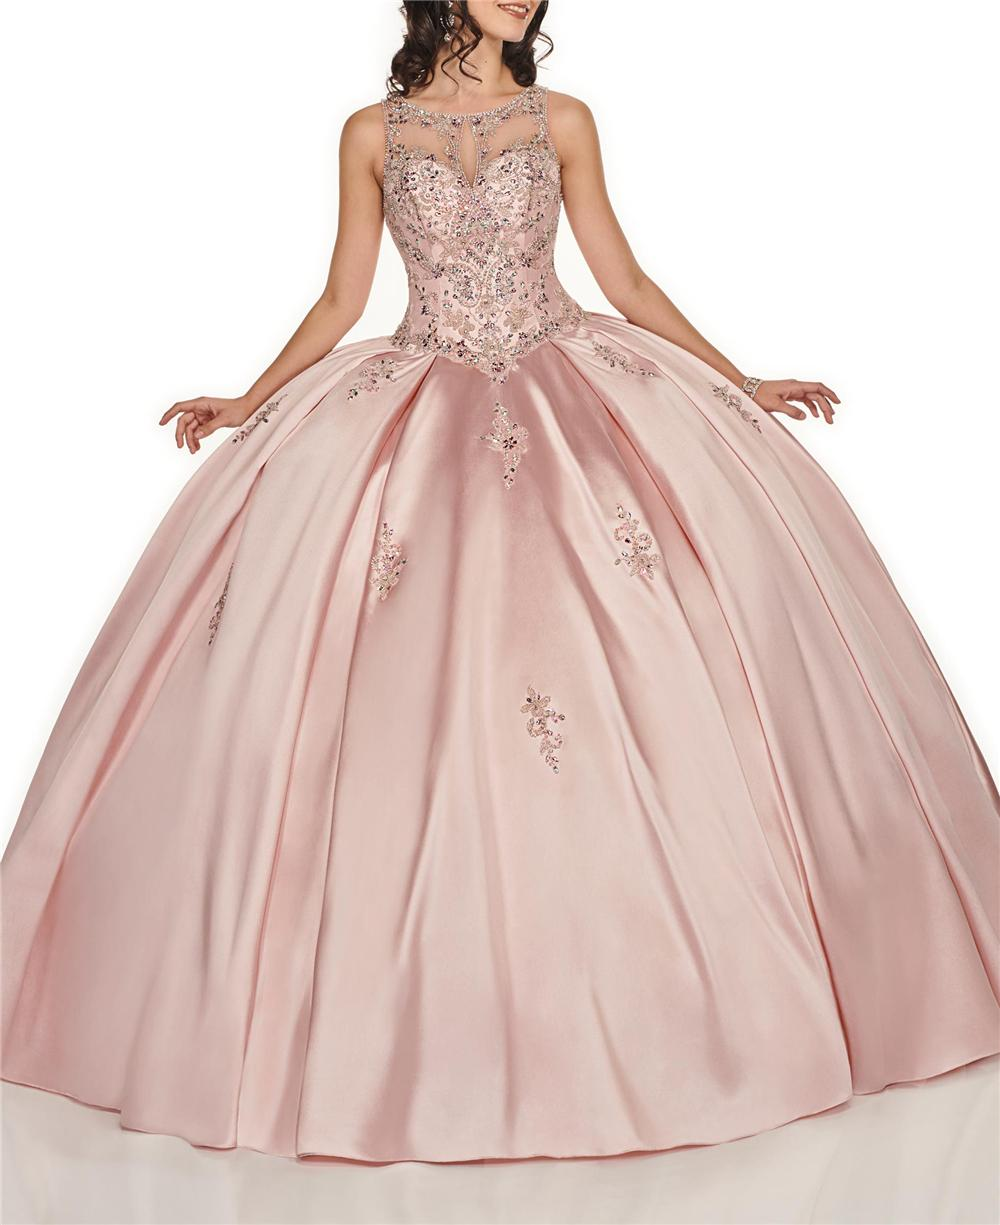 Pink Satin vestidos 15 Anos Quinceanera платья Scoop Аппликация Бисероплетение Vintages Lace-Up Backhole Сладкие 16 Quinceanera платья